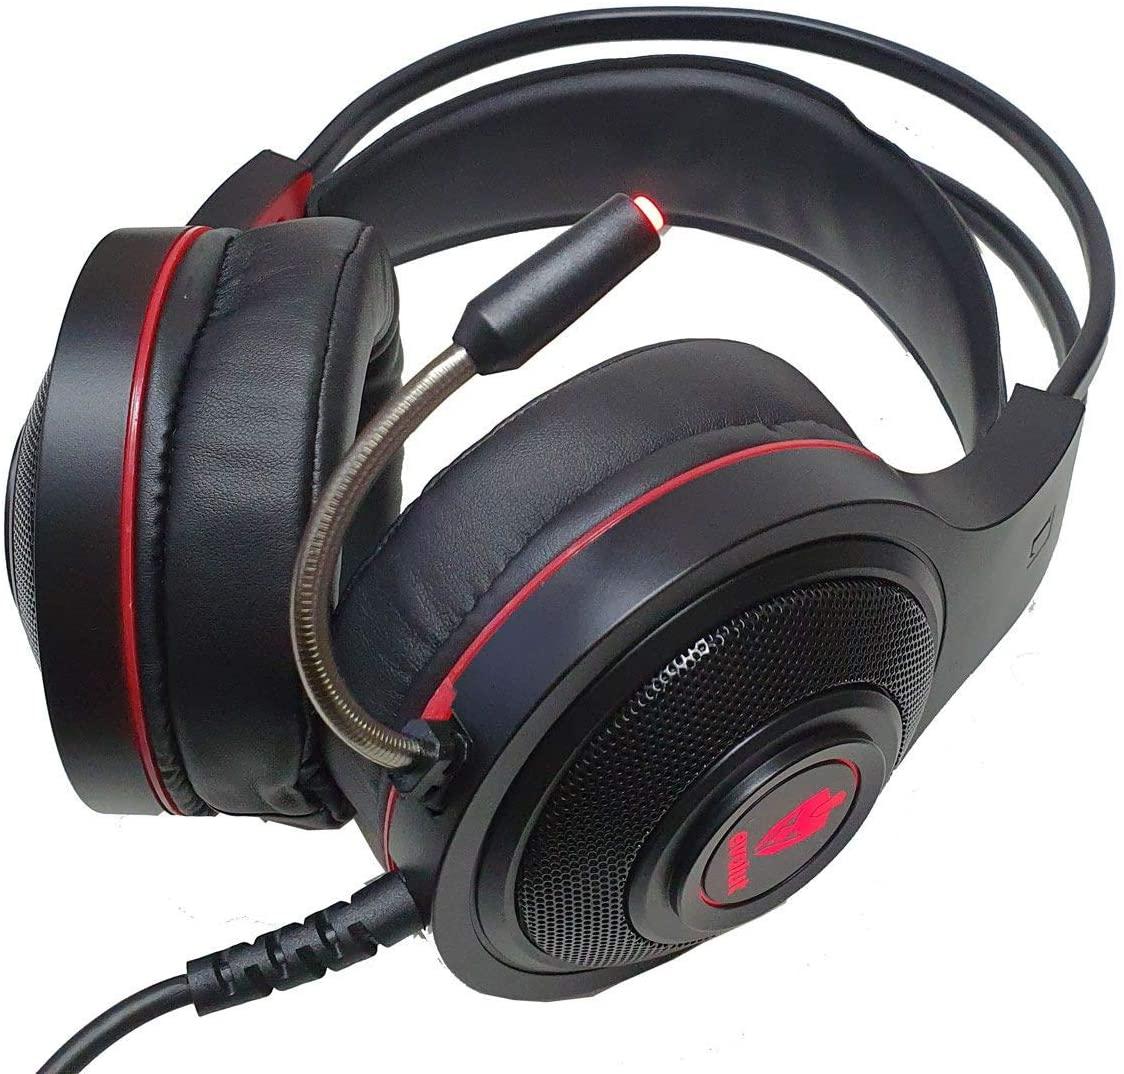 Fone de Ouvido Headset Gamer EG301R Têmis Evolut